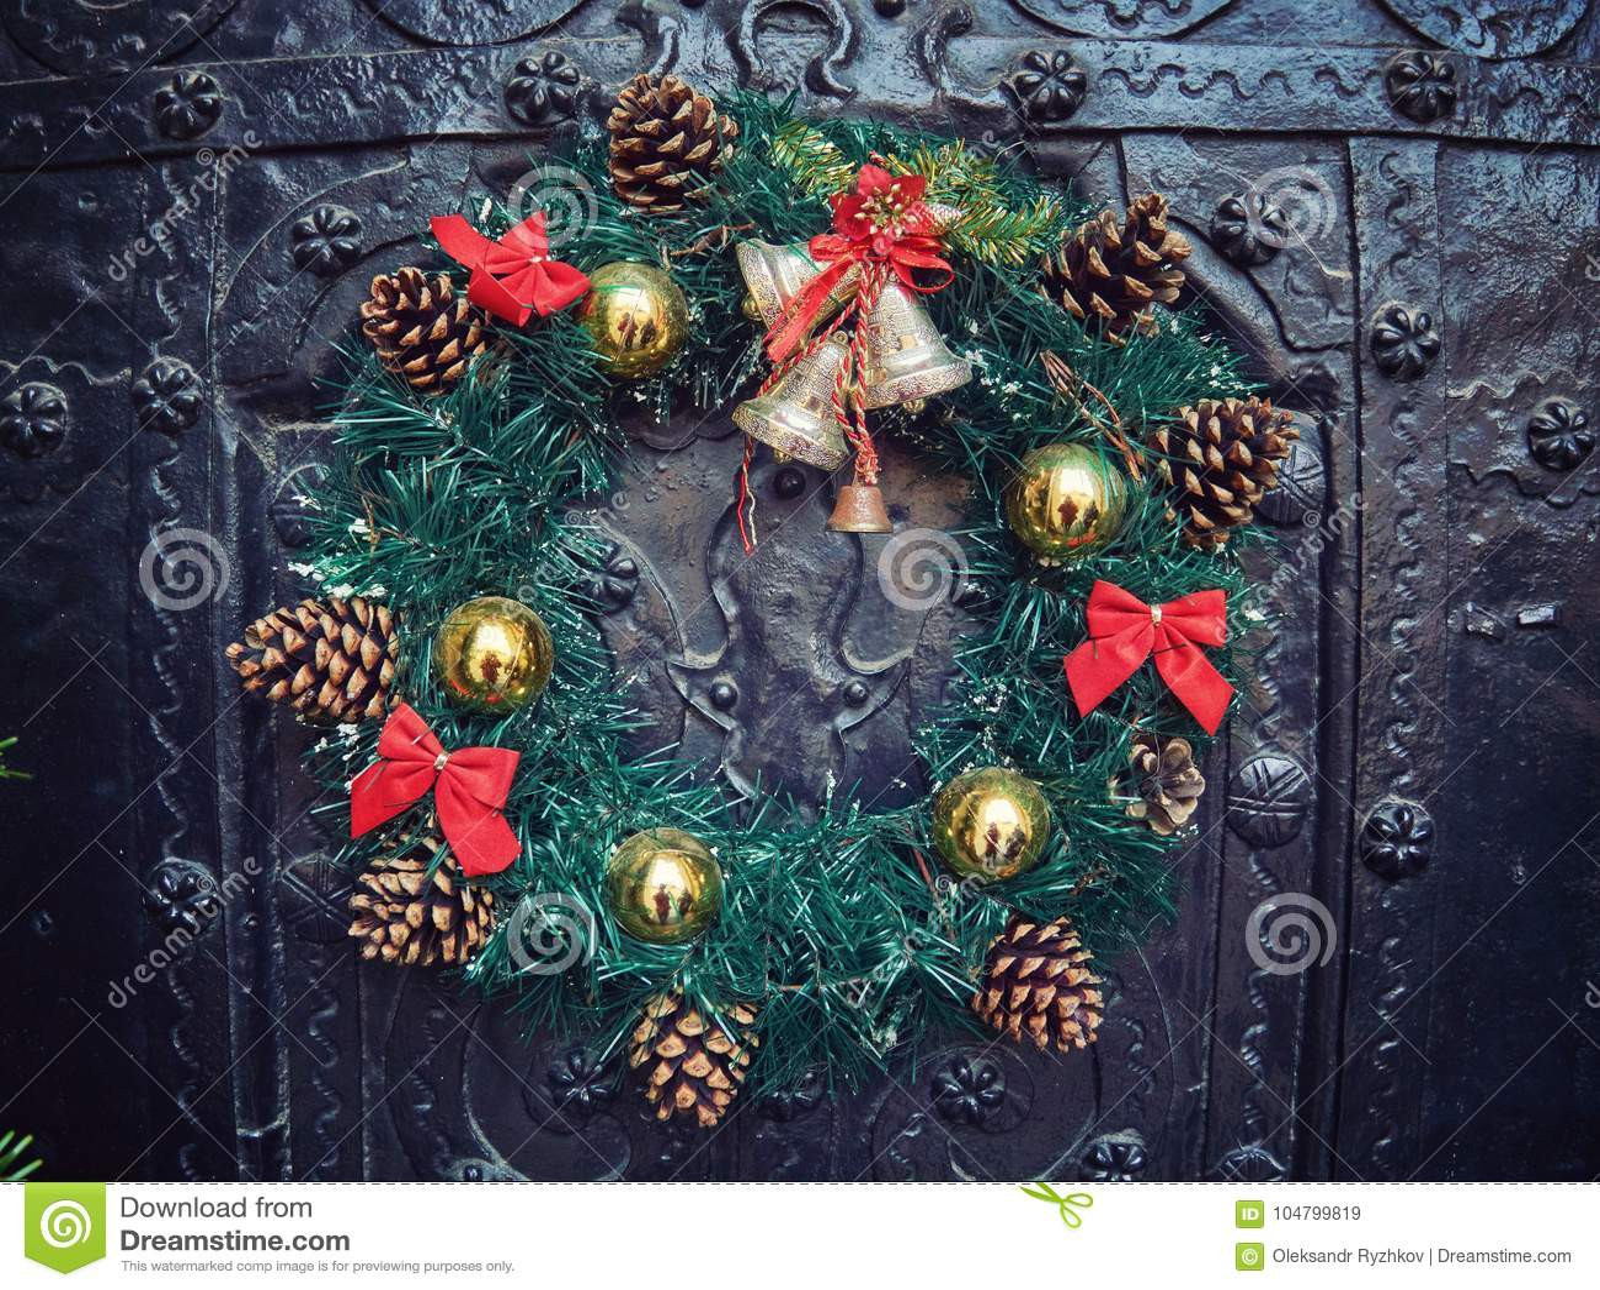 Wreath Salad For Christmas Stock Image Image Of Holiday 104799819